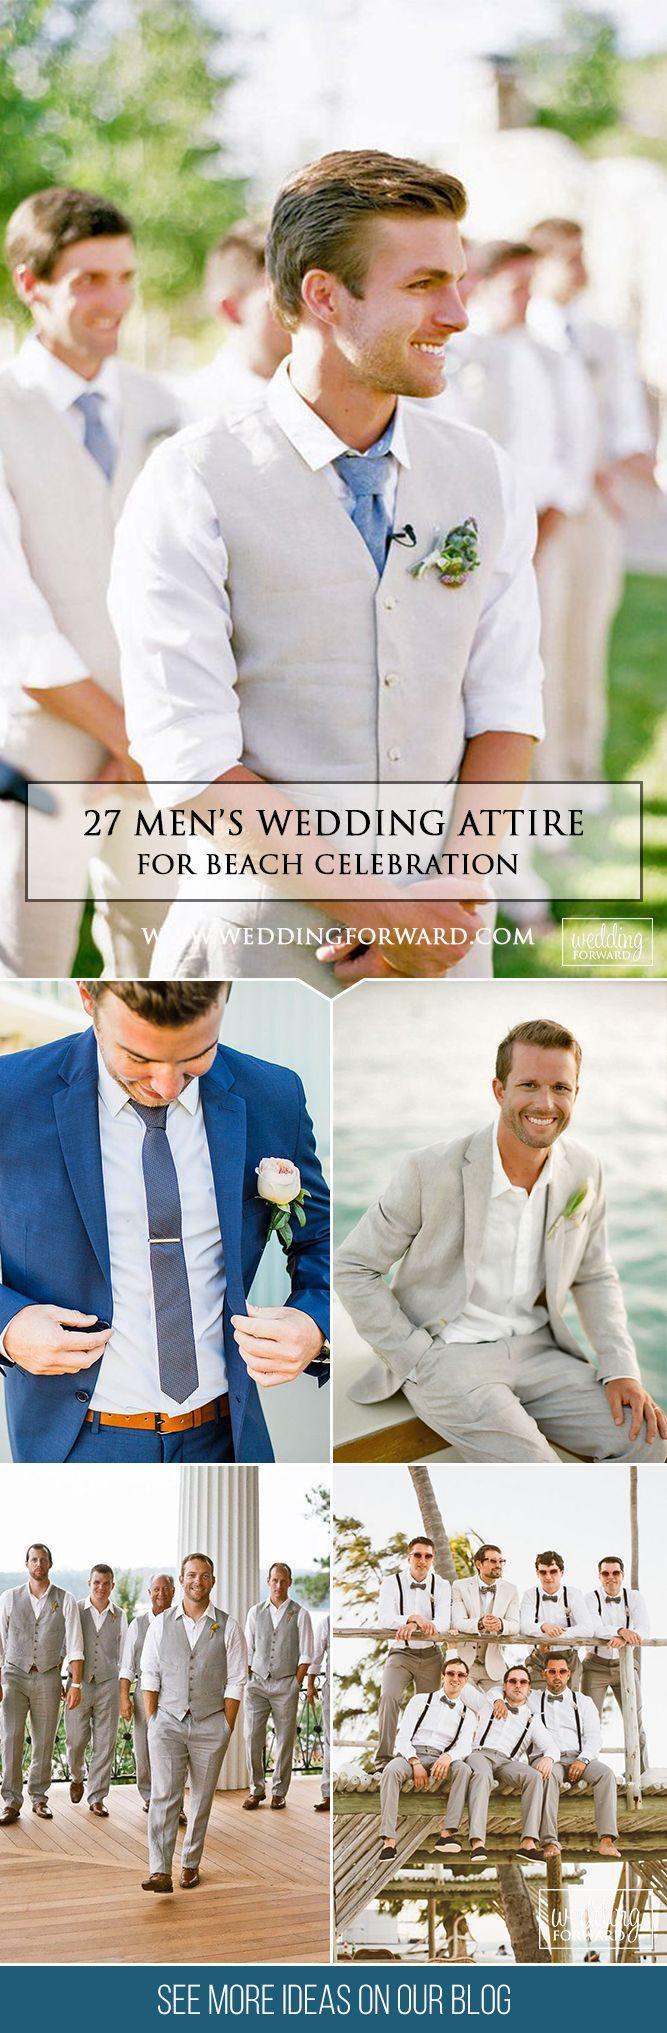 24 Mens Wedding Attire For Beach Celebration